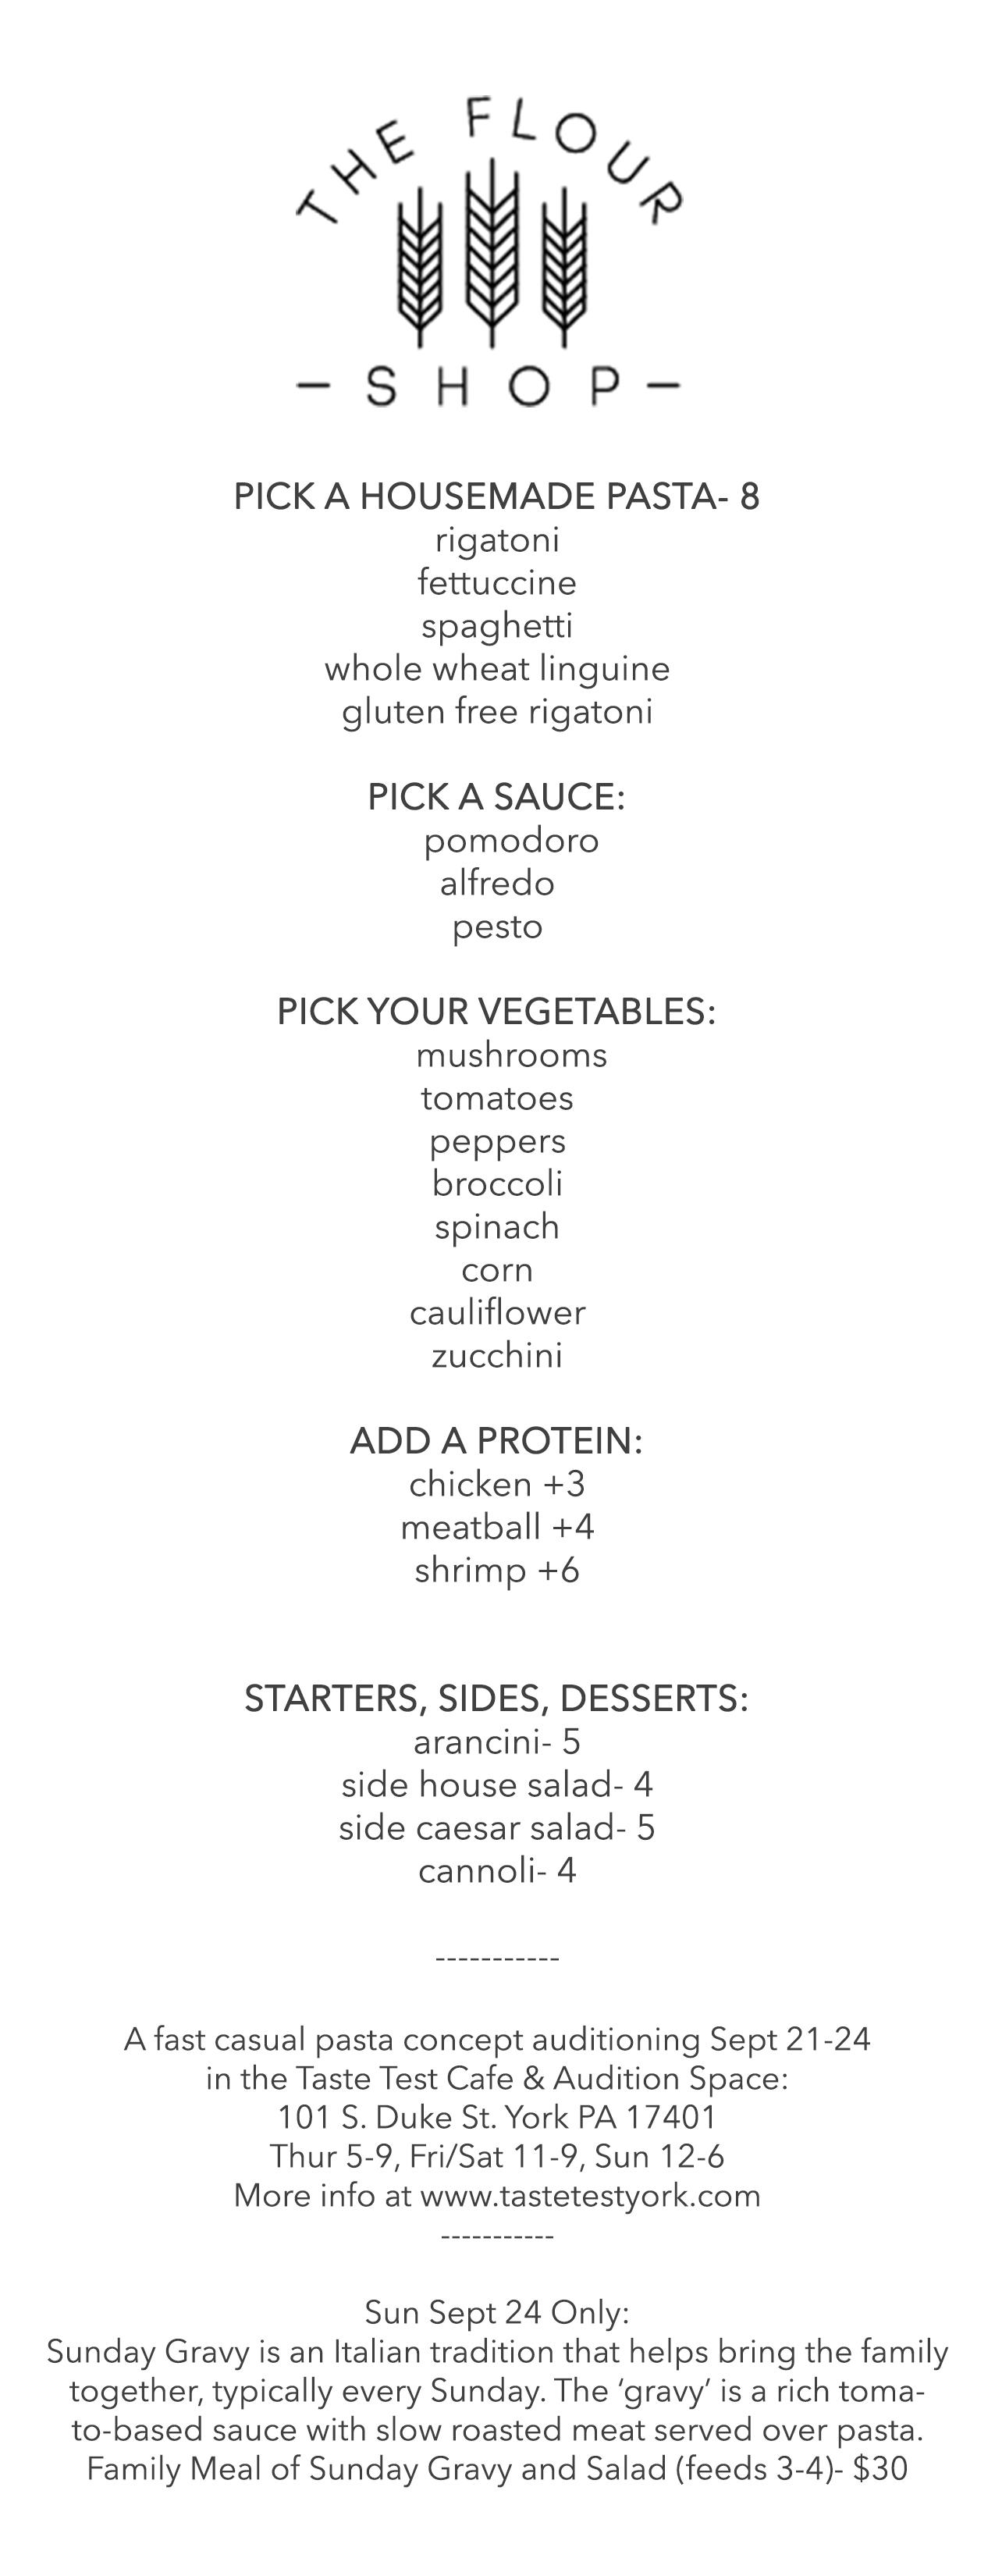 flour shop  menu.jpg